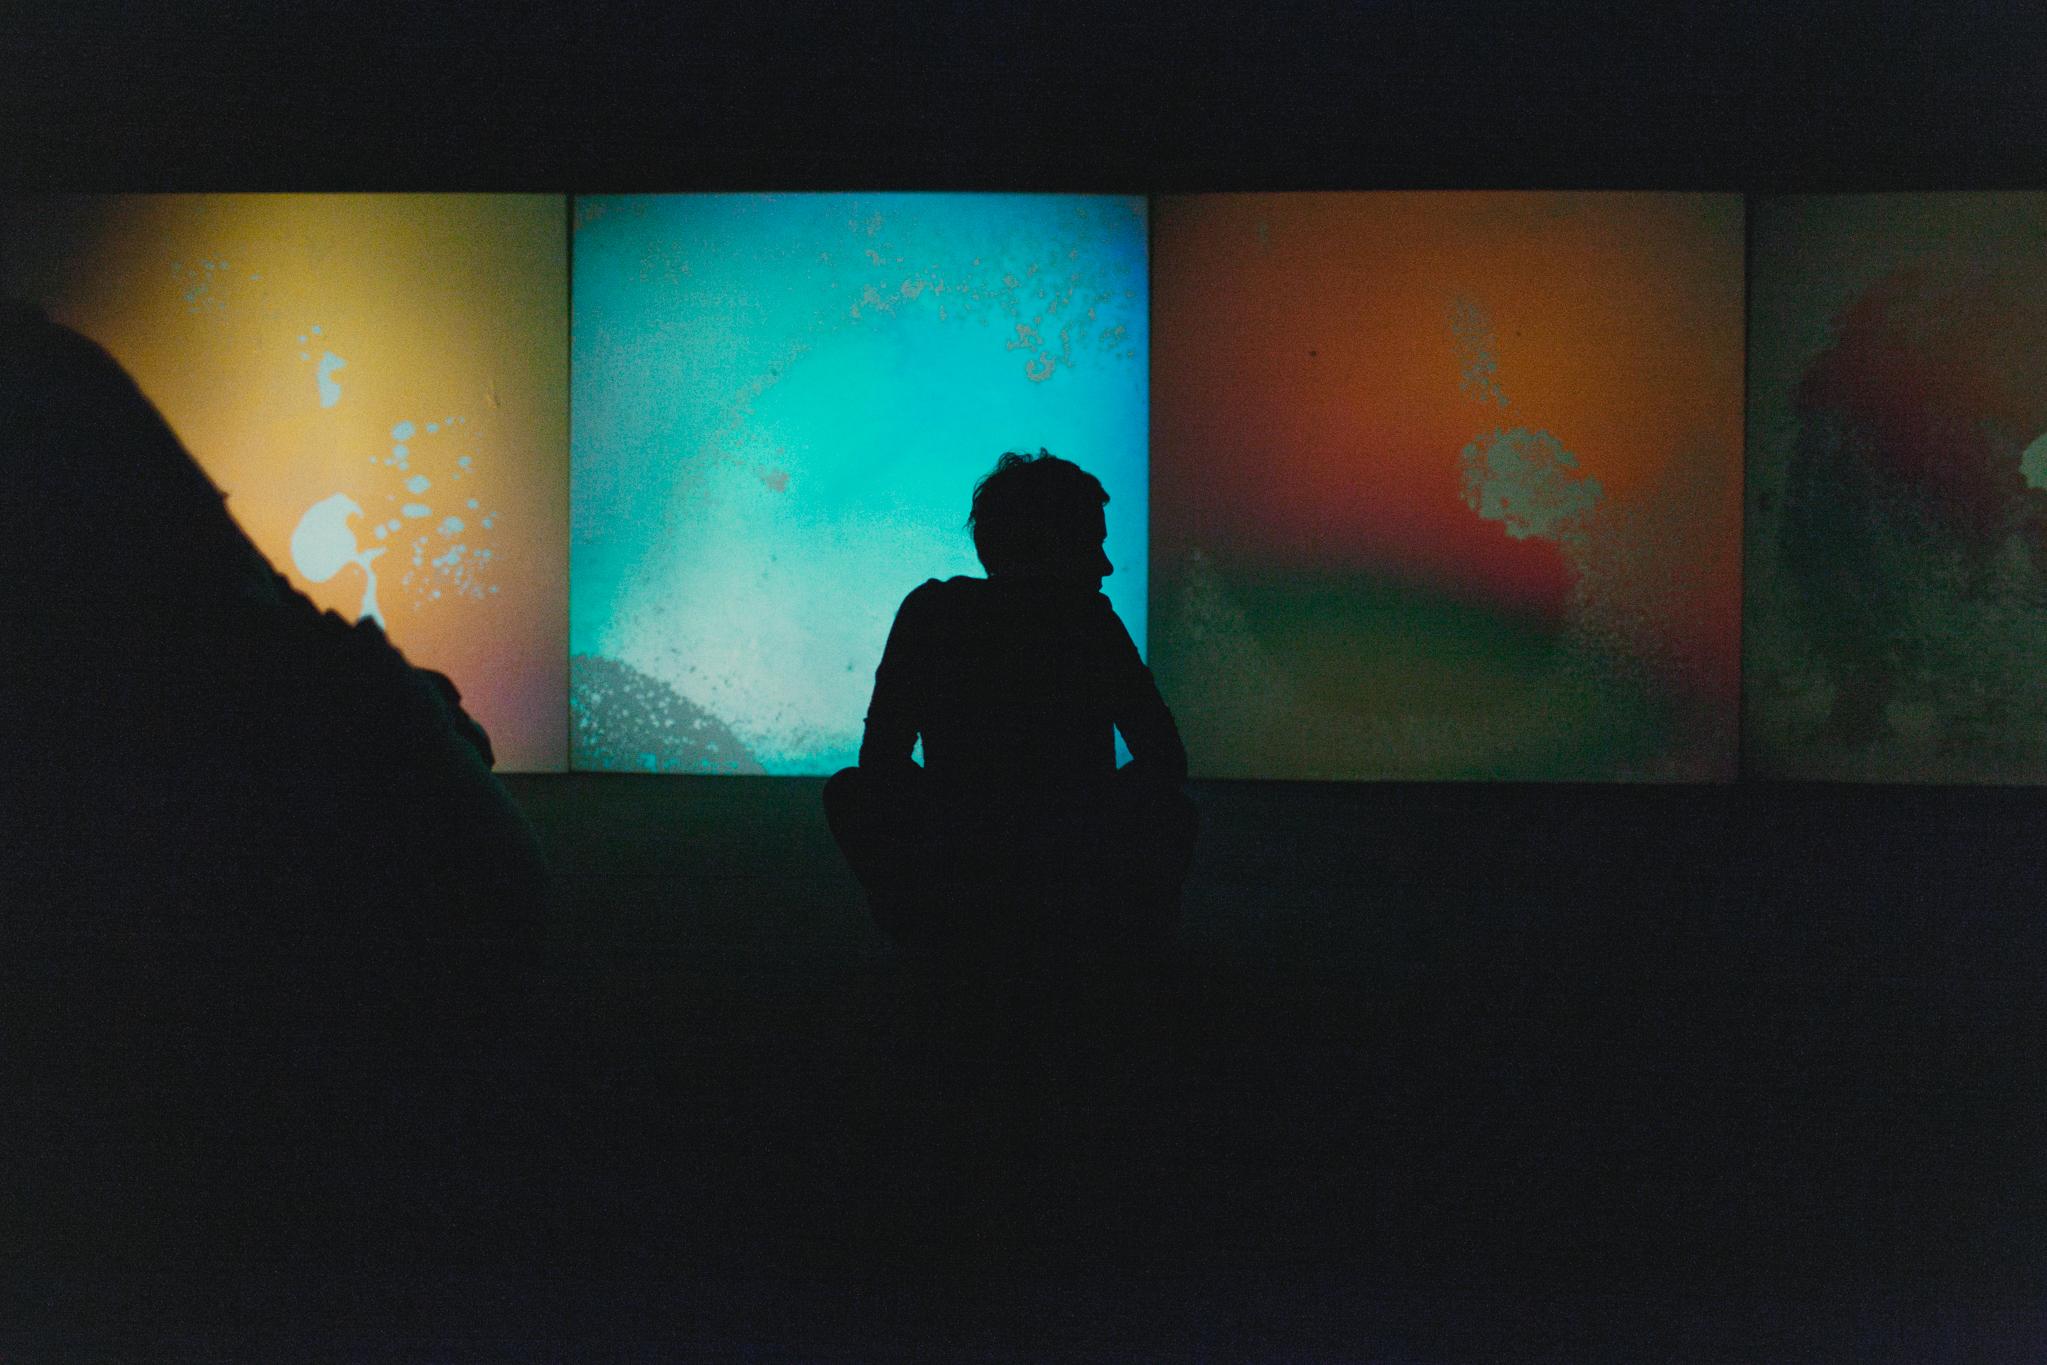 Gustaw Metzger, widok wystawy